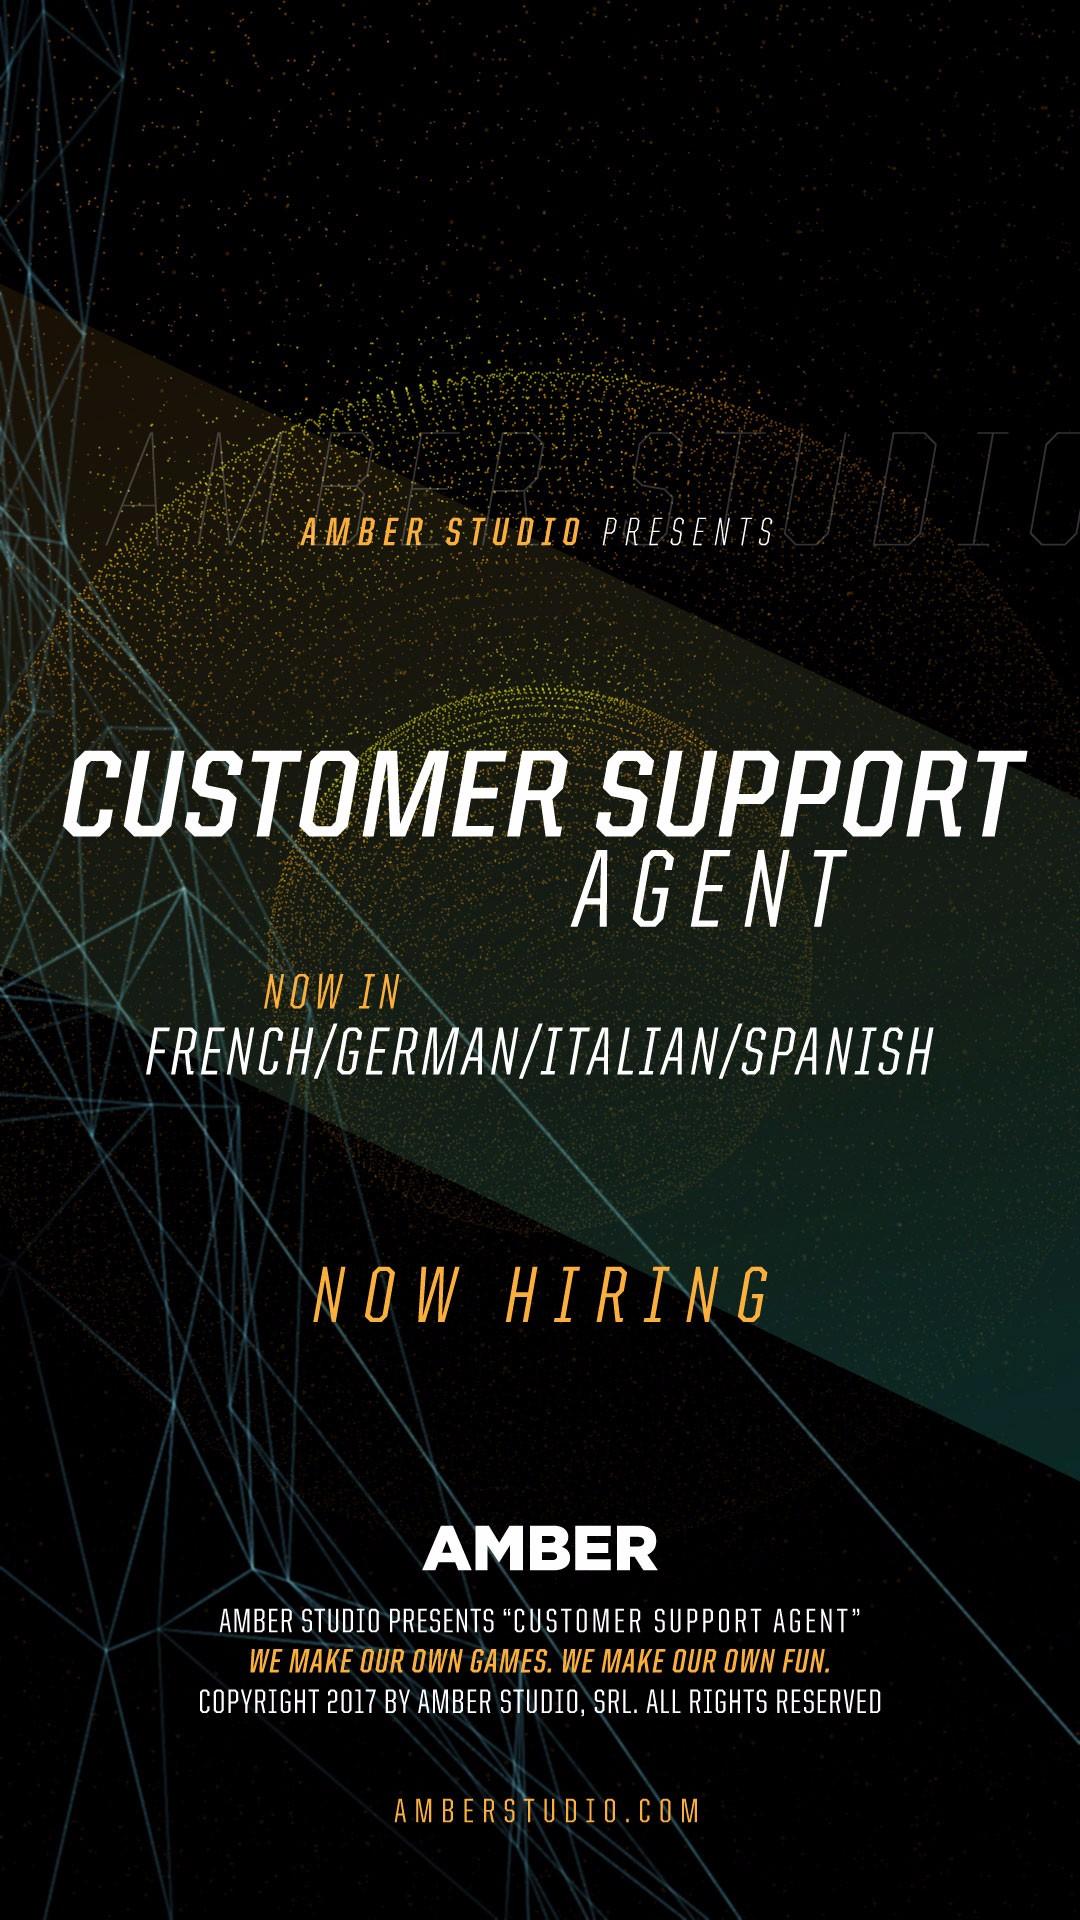 customersupportagent